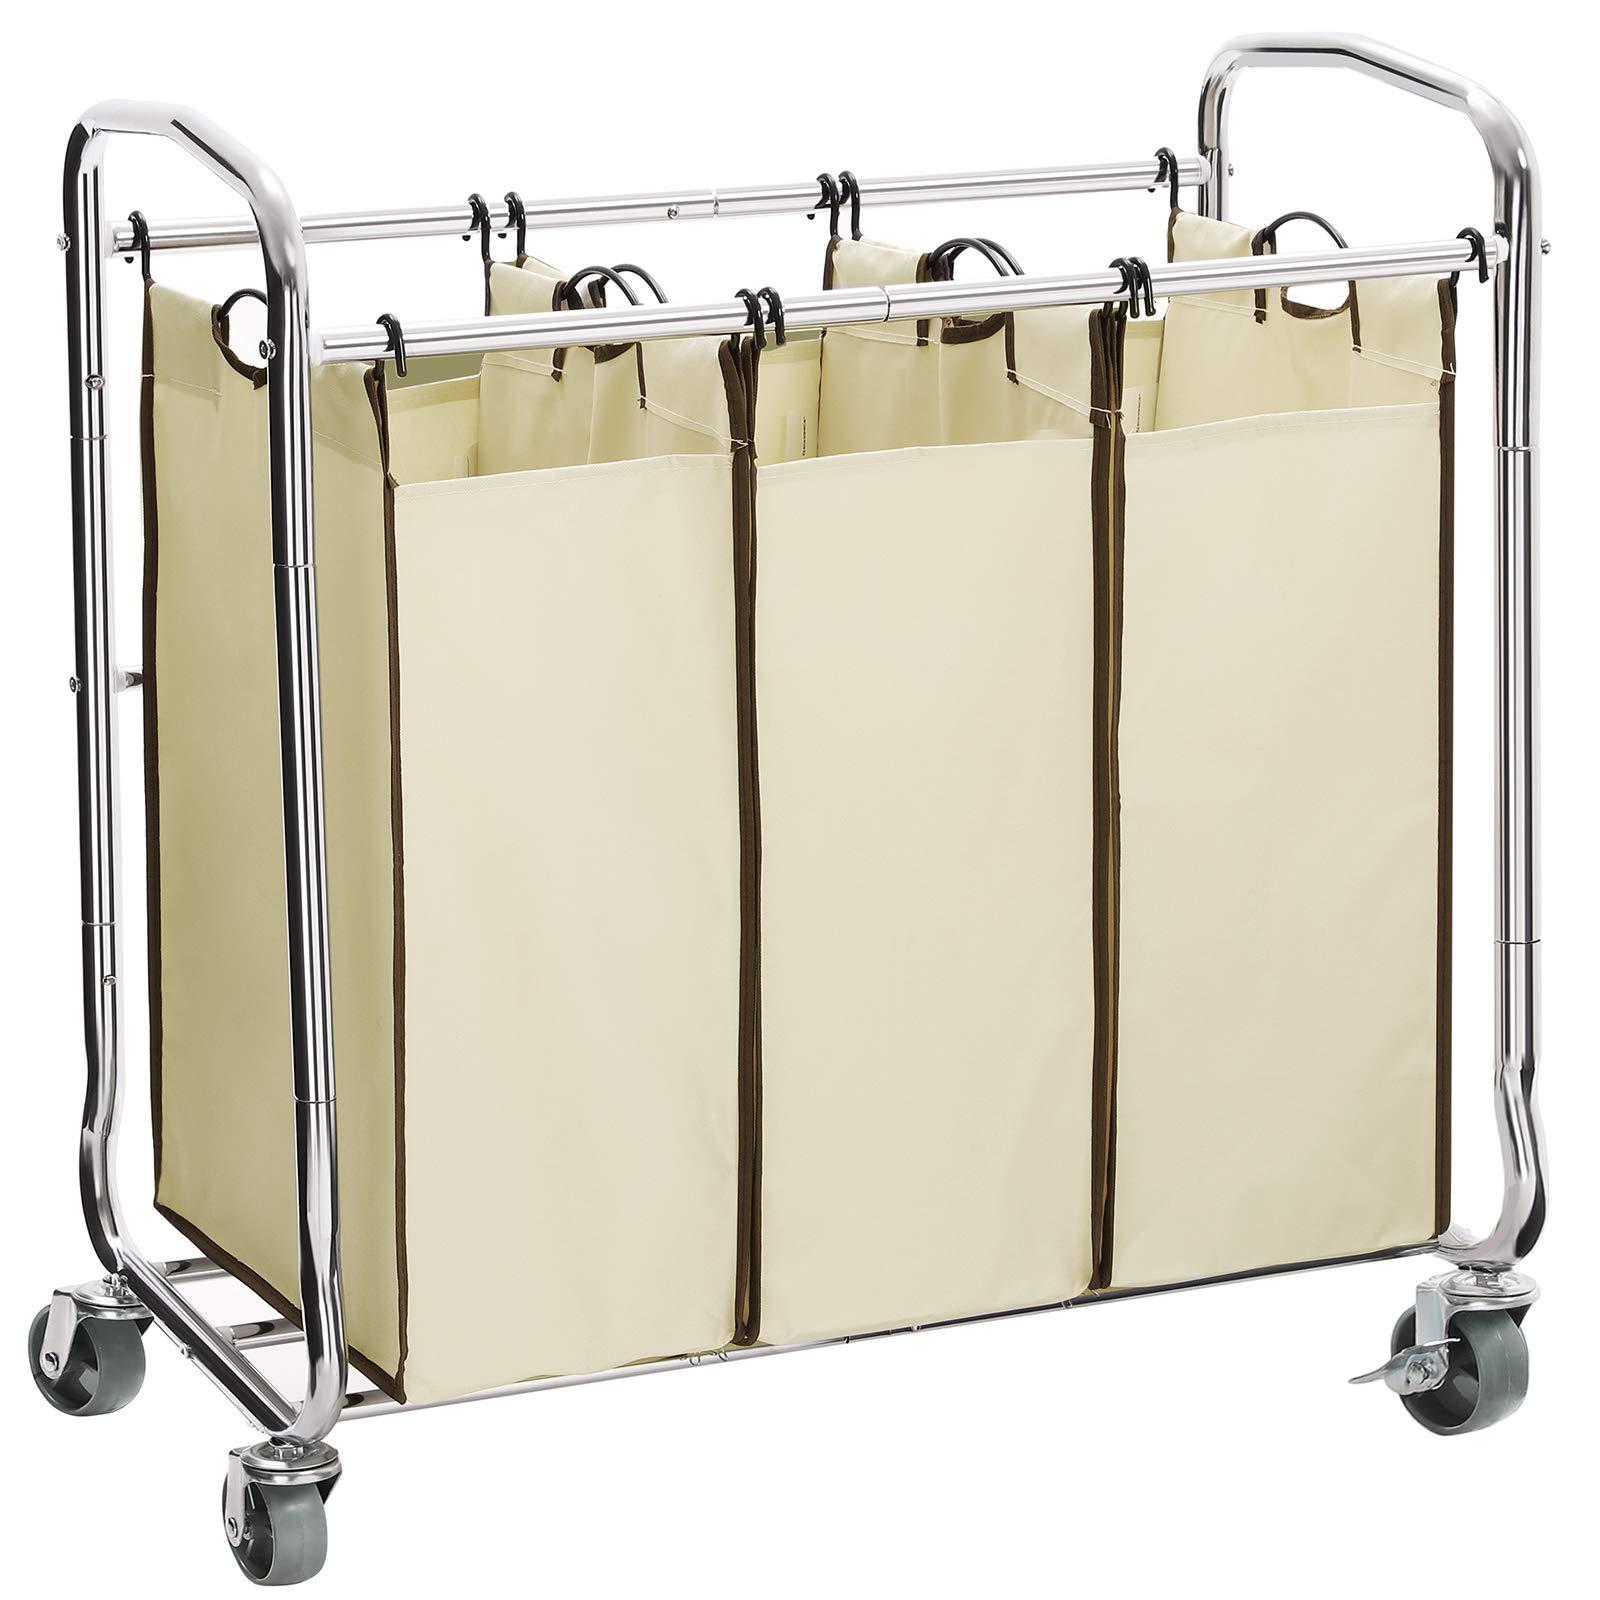 SONGMICS 3-Bag Laundry Sorter Cart on Wheels, Heavy Duty Hamper with Removable Bags, Beige, URLS72MZ